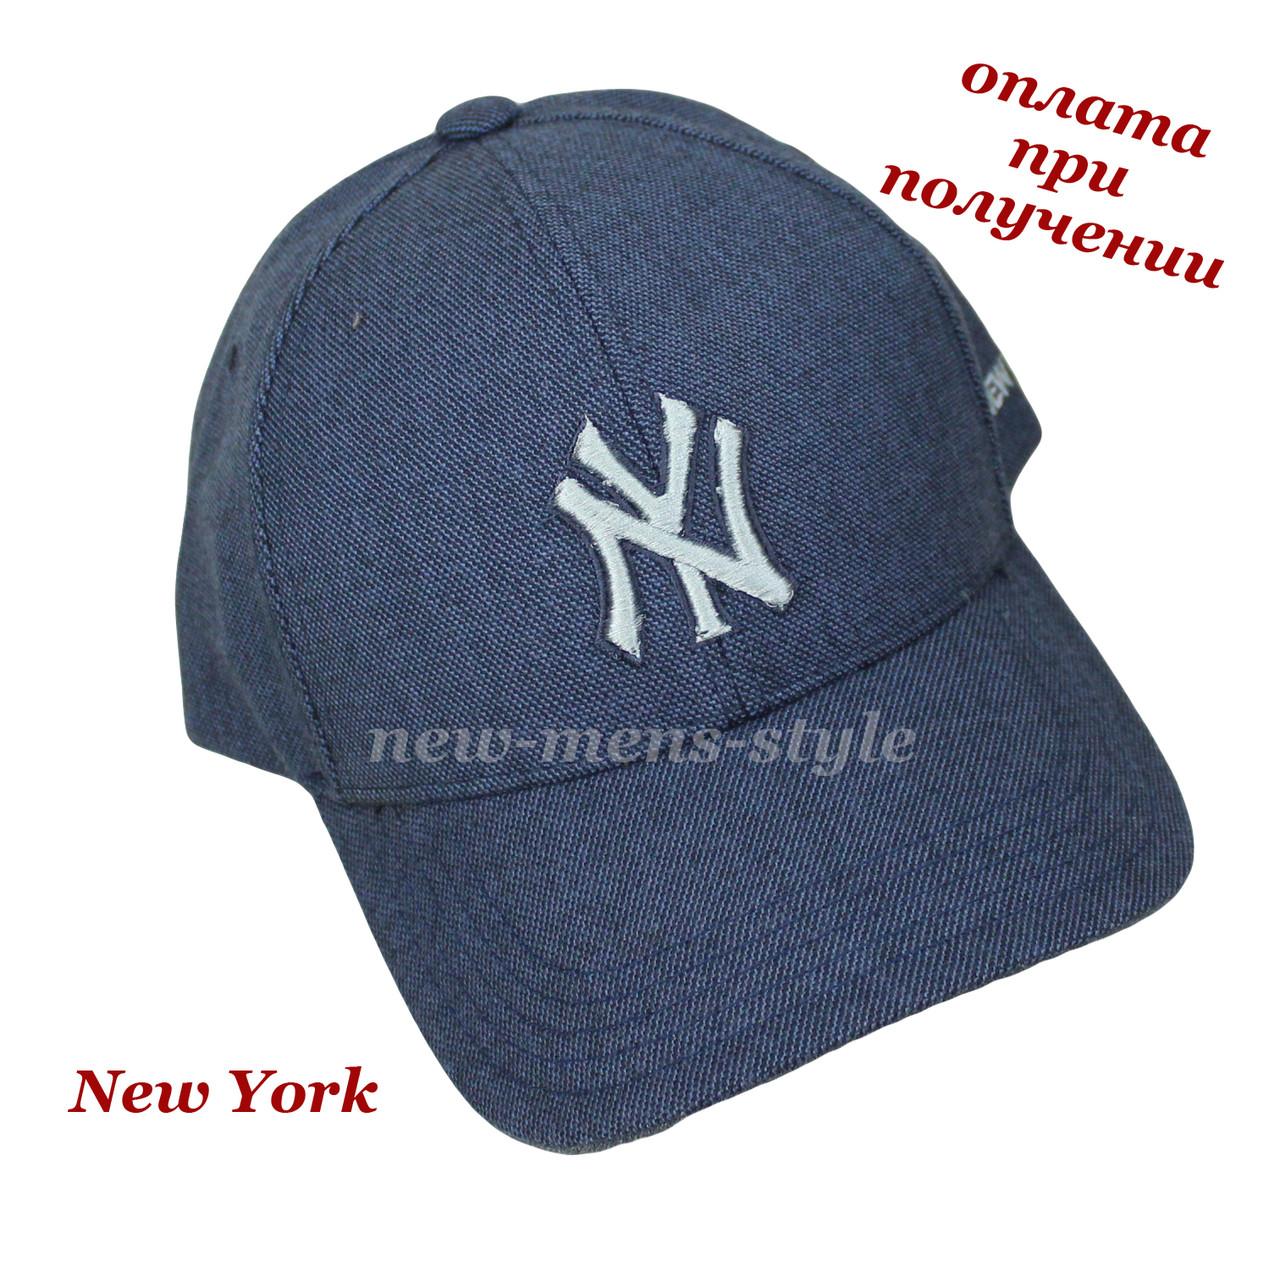 Чоловіча модна стильна спортивна кепка бейсболка блайзер NY New York синя